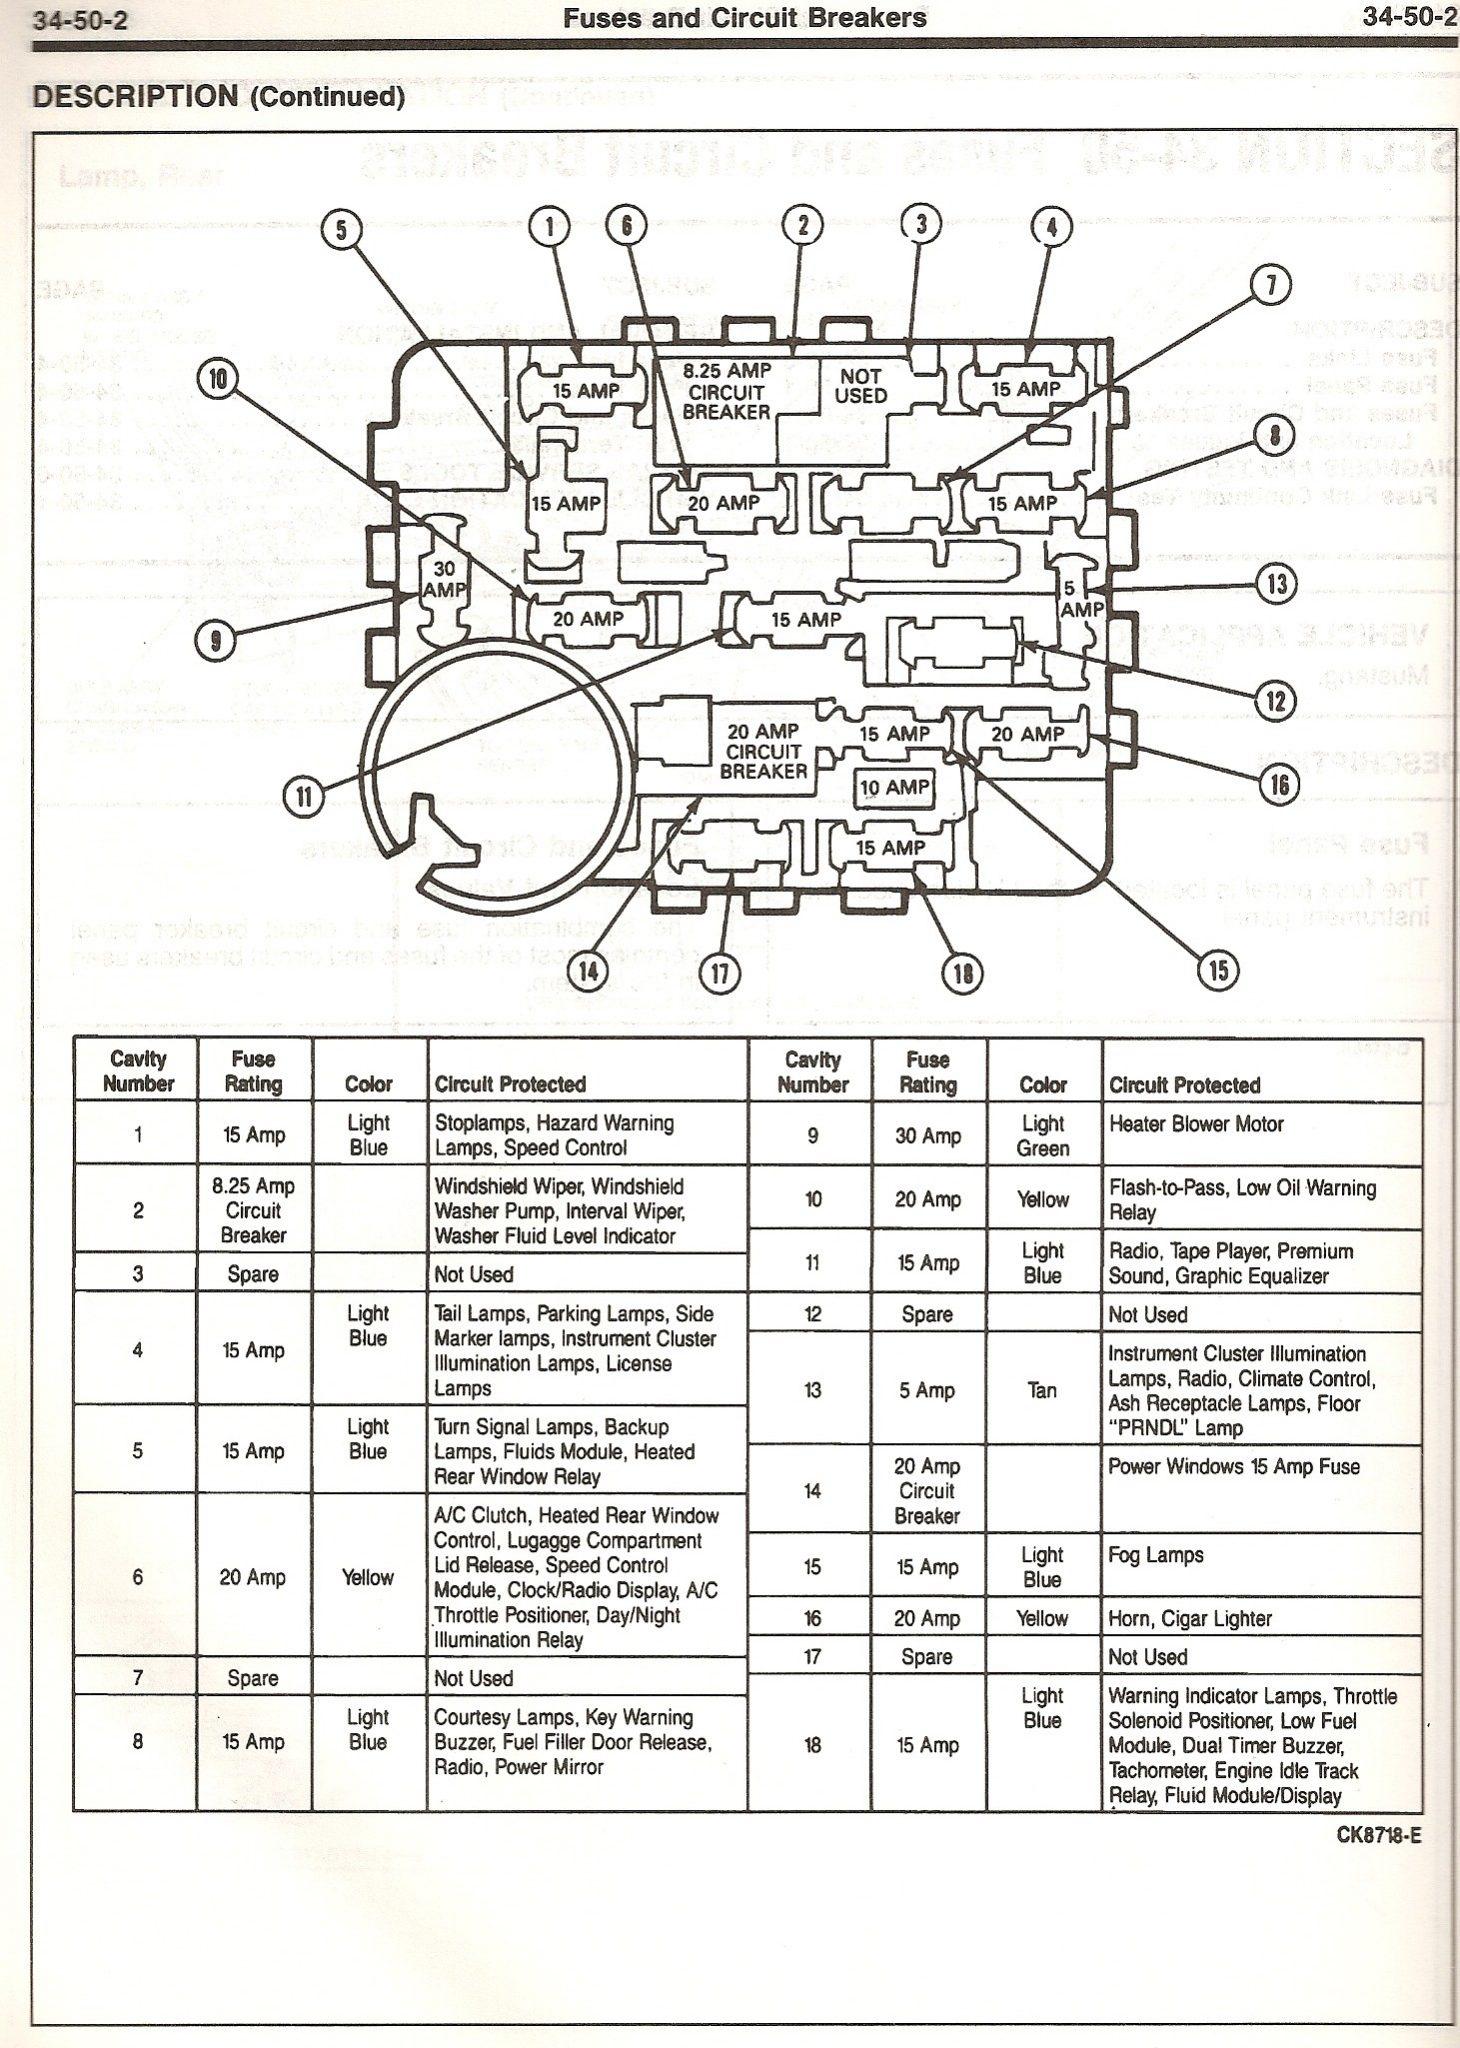 Volvo B10m Fuse Box Wiring Diagrams 2001 S40 Diagram 240